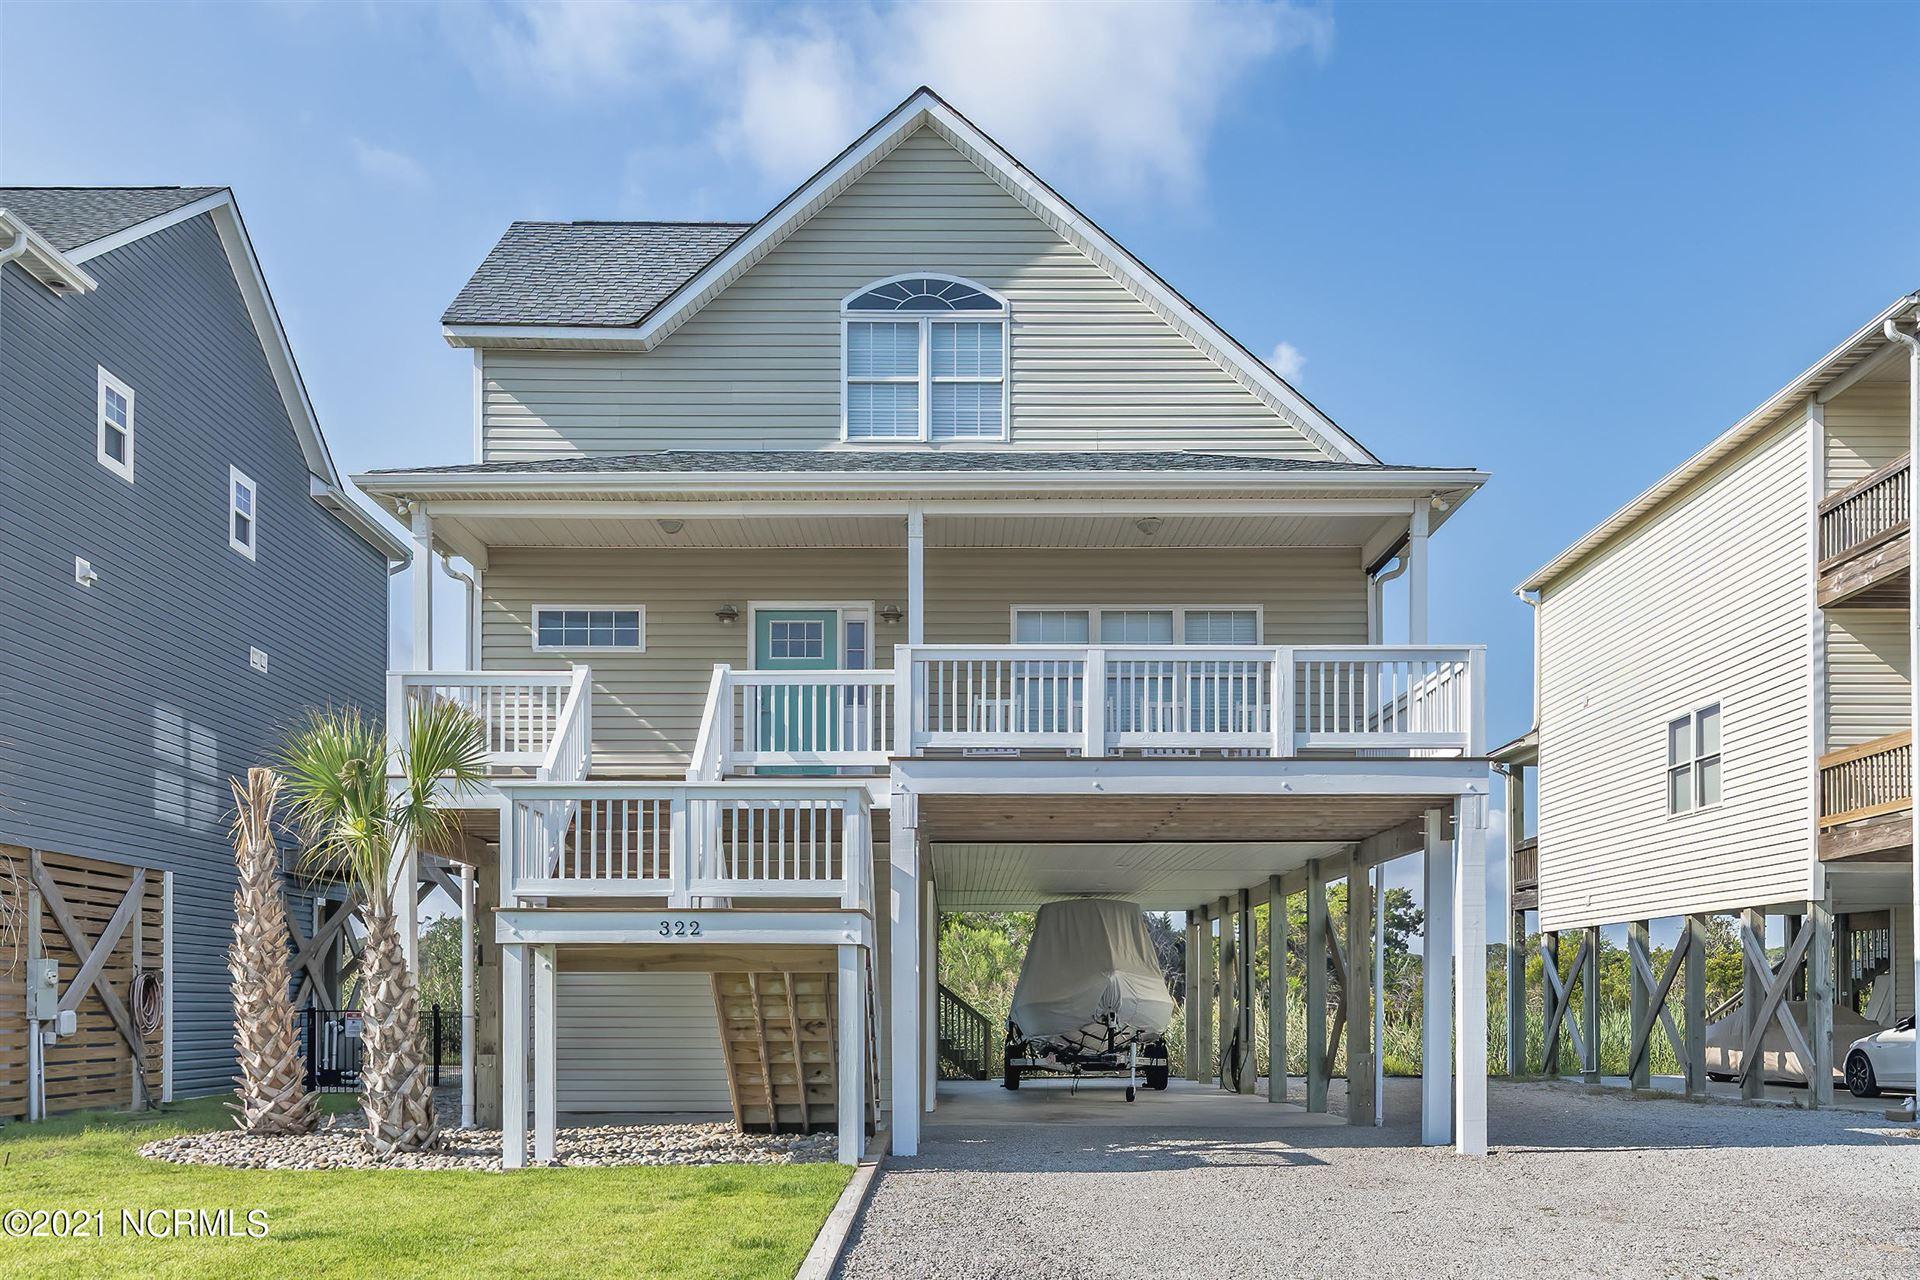 Photo for 322 E Dolphin Drive, Oak Island, NC 28465 (MLS # 100285516)